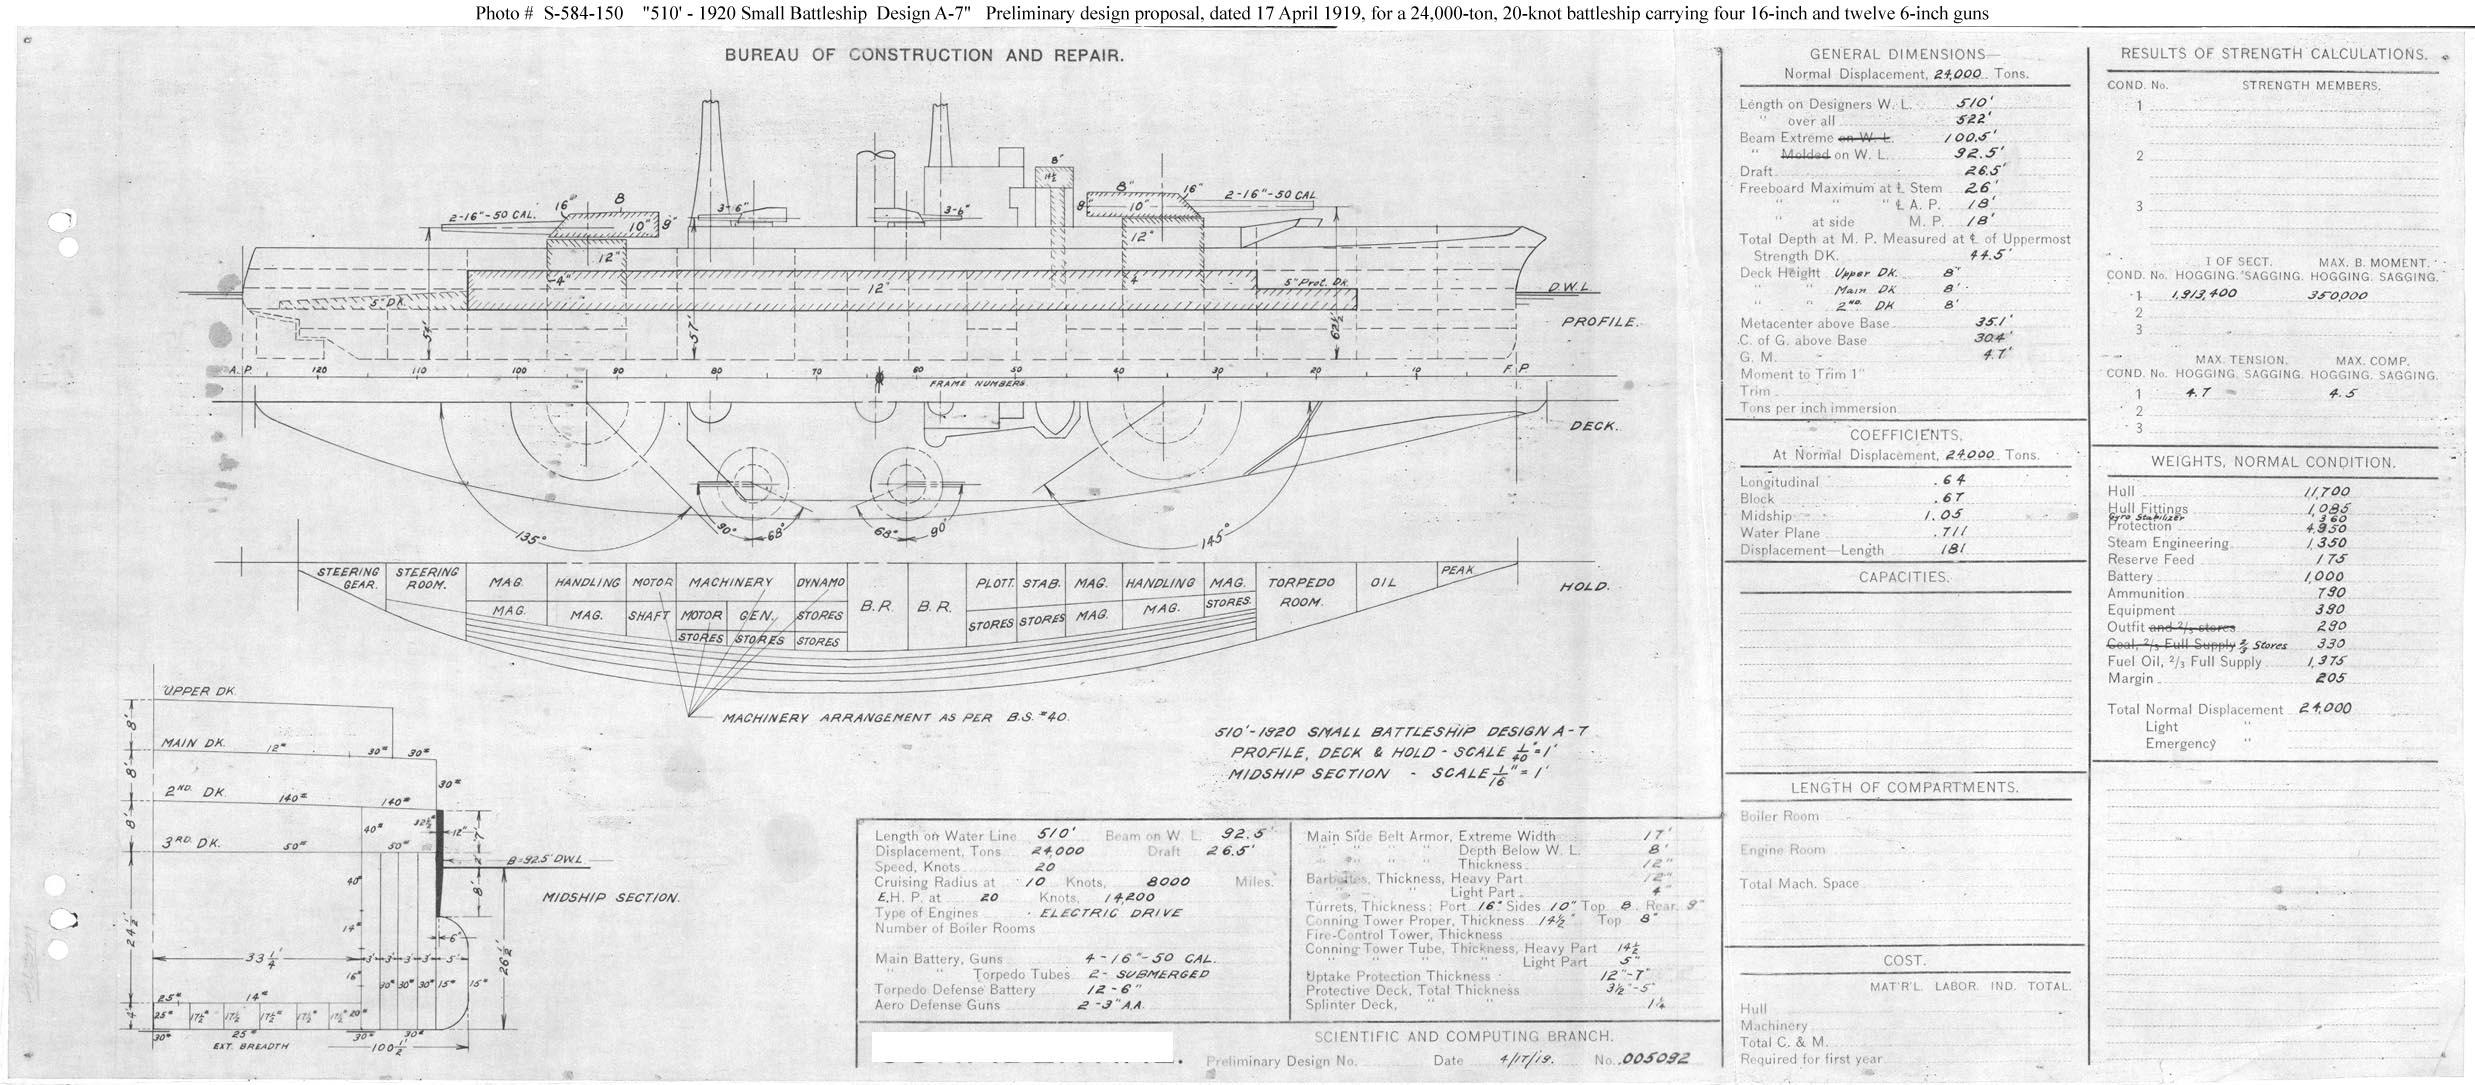 The Design Small Battleship Series